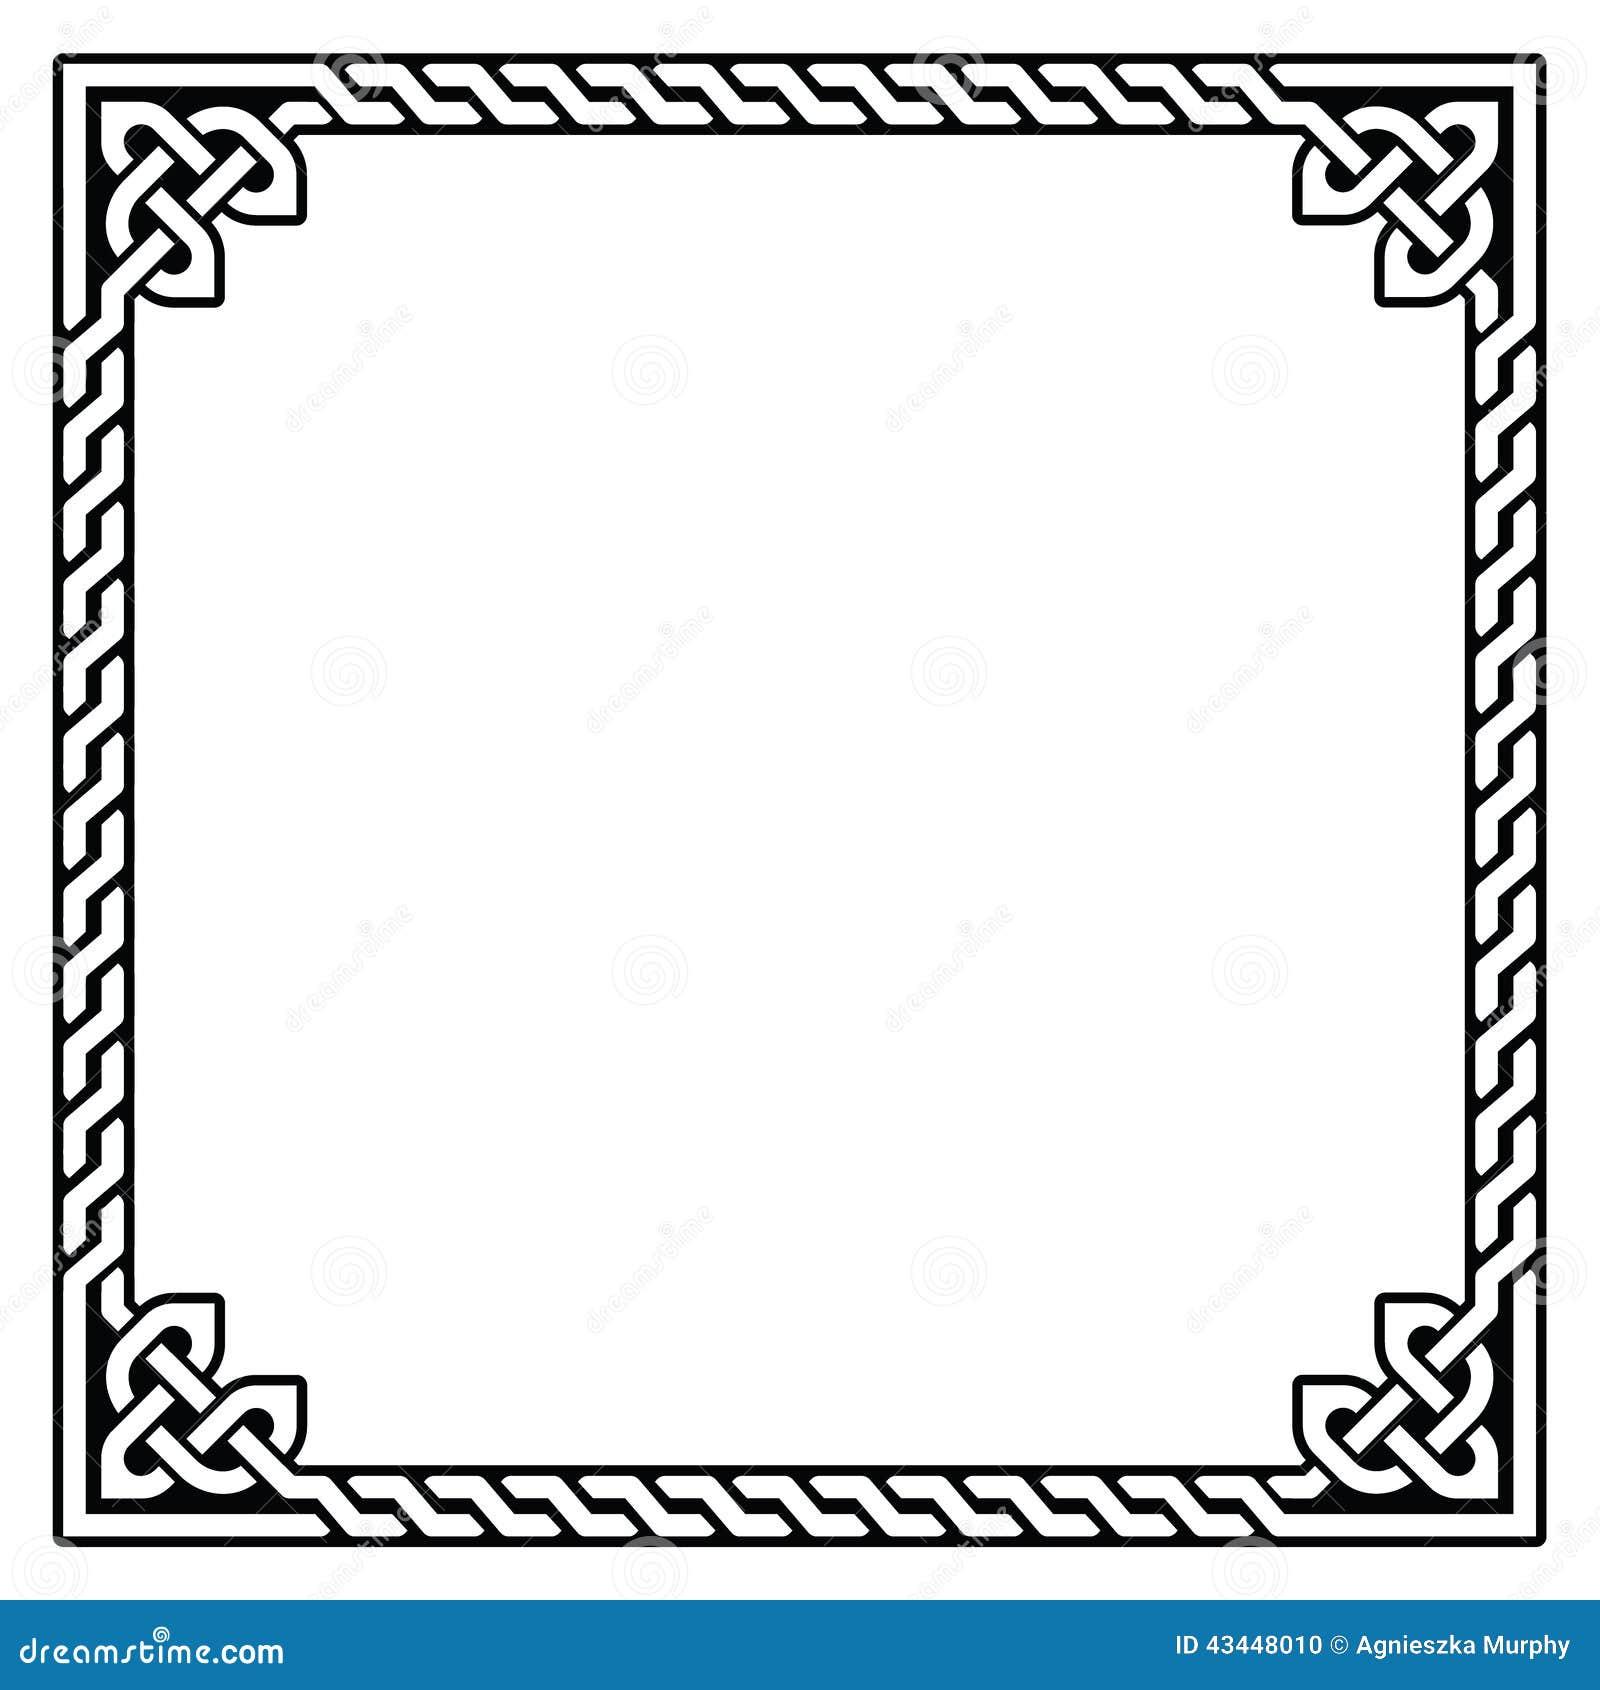 Iren  keltisches Muster des schwarzen Quadrats lokalisiert auf Wei  223  Simple Celtic Knot Square